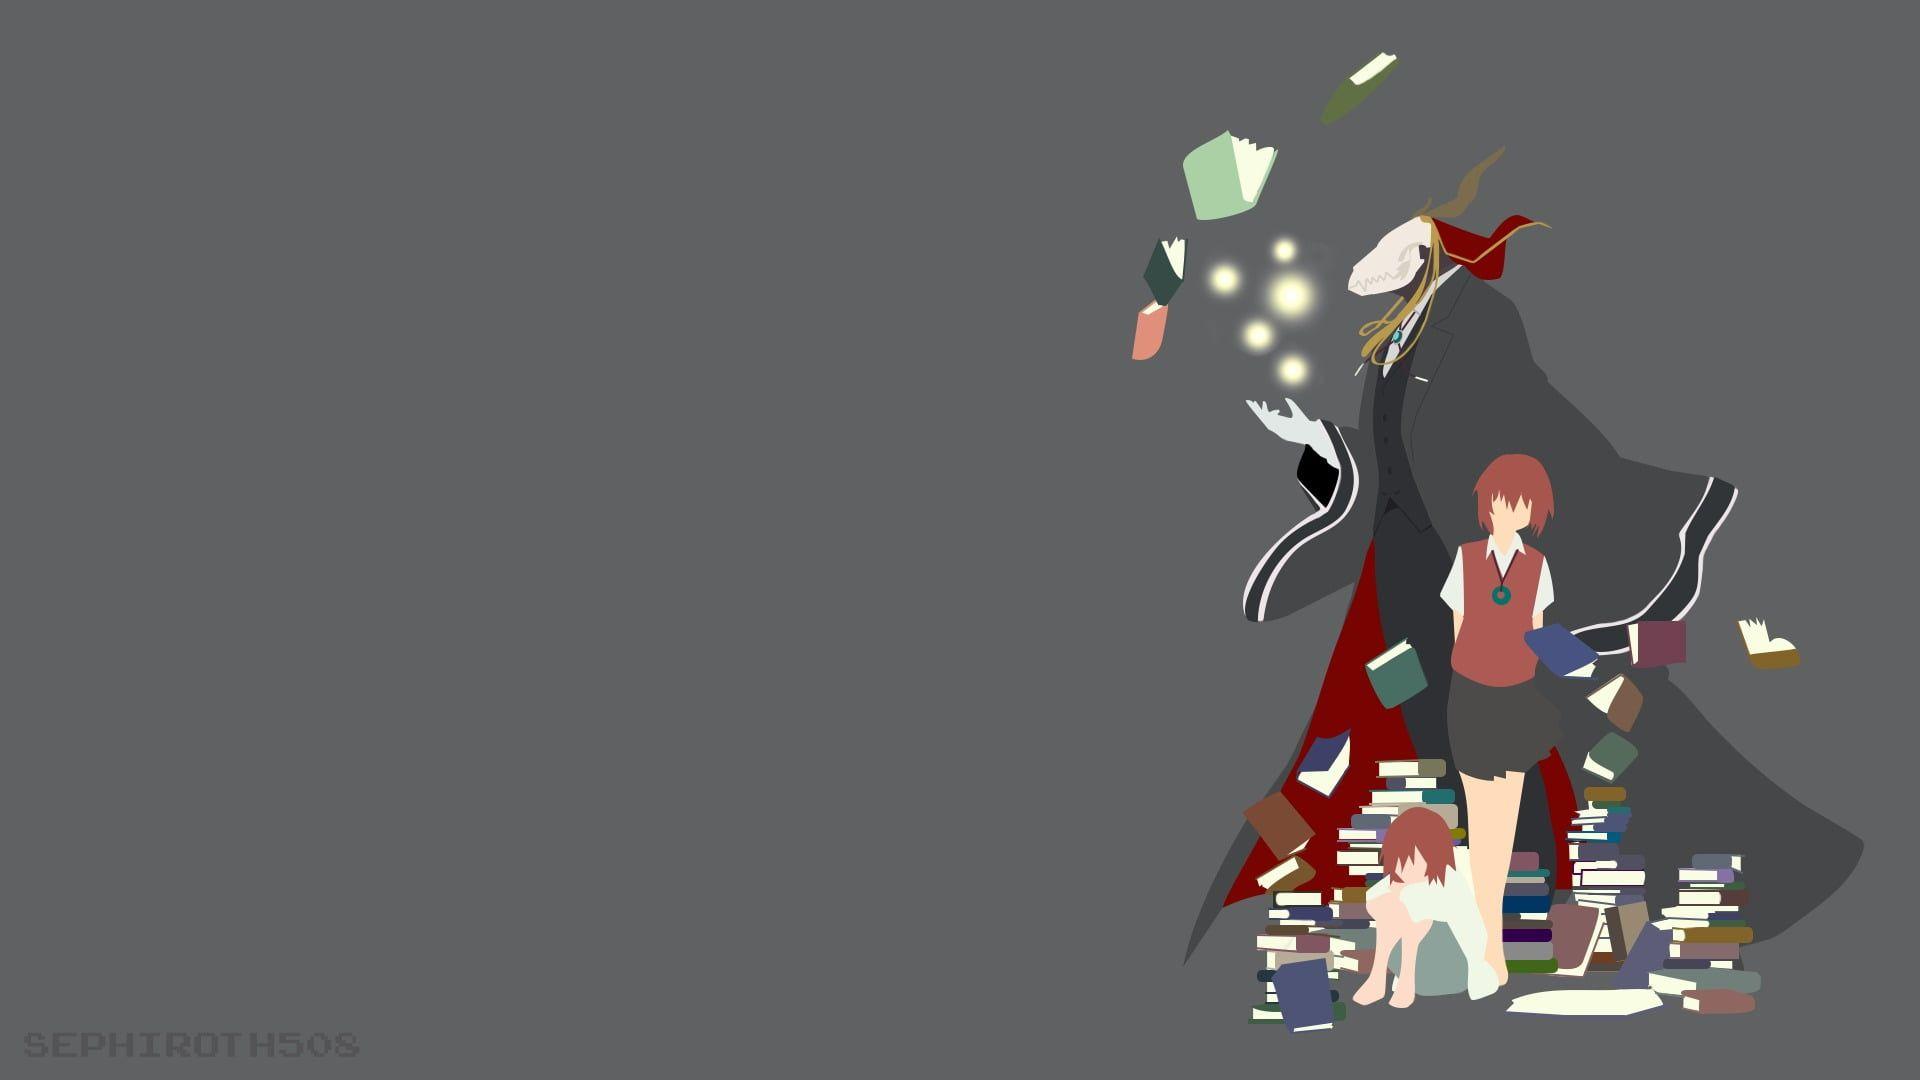 Woman In Red And Black Minidress Illustration Mahoutsukai No Yome